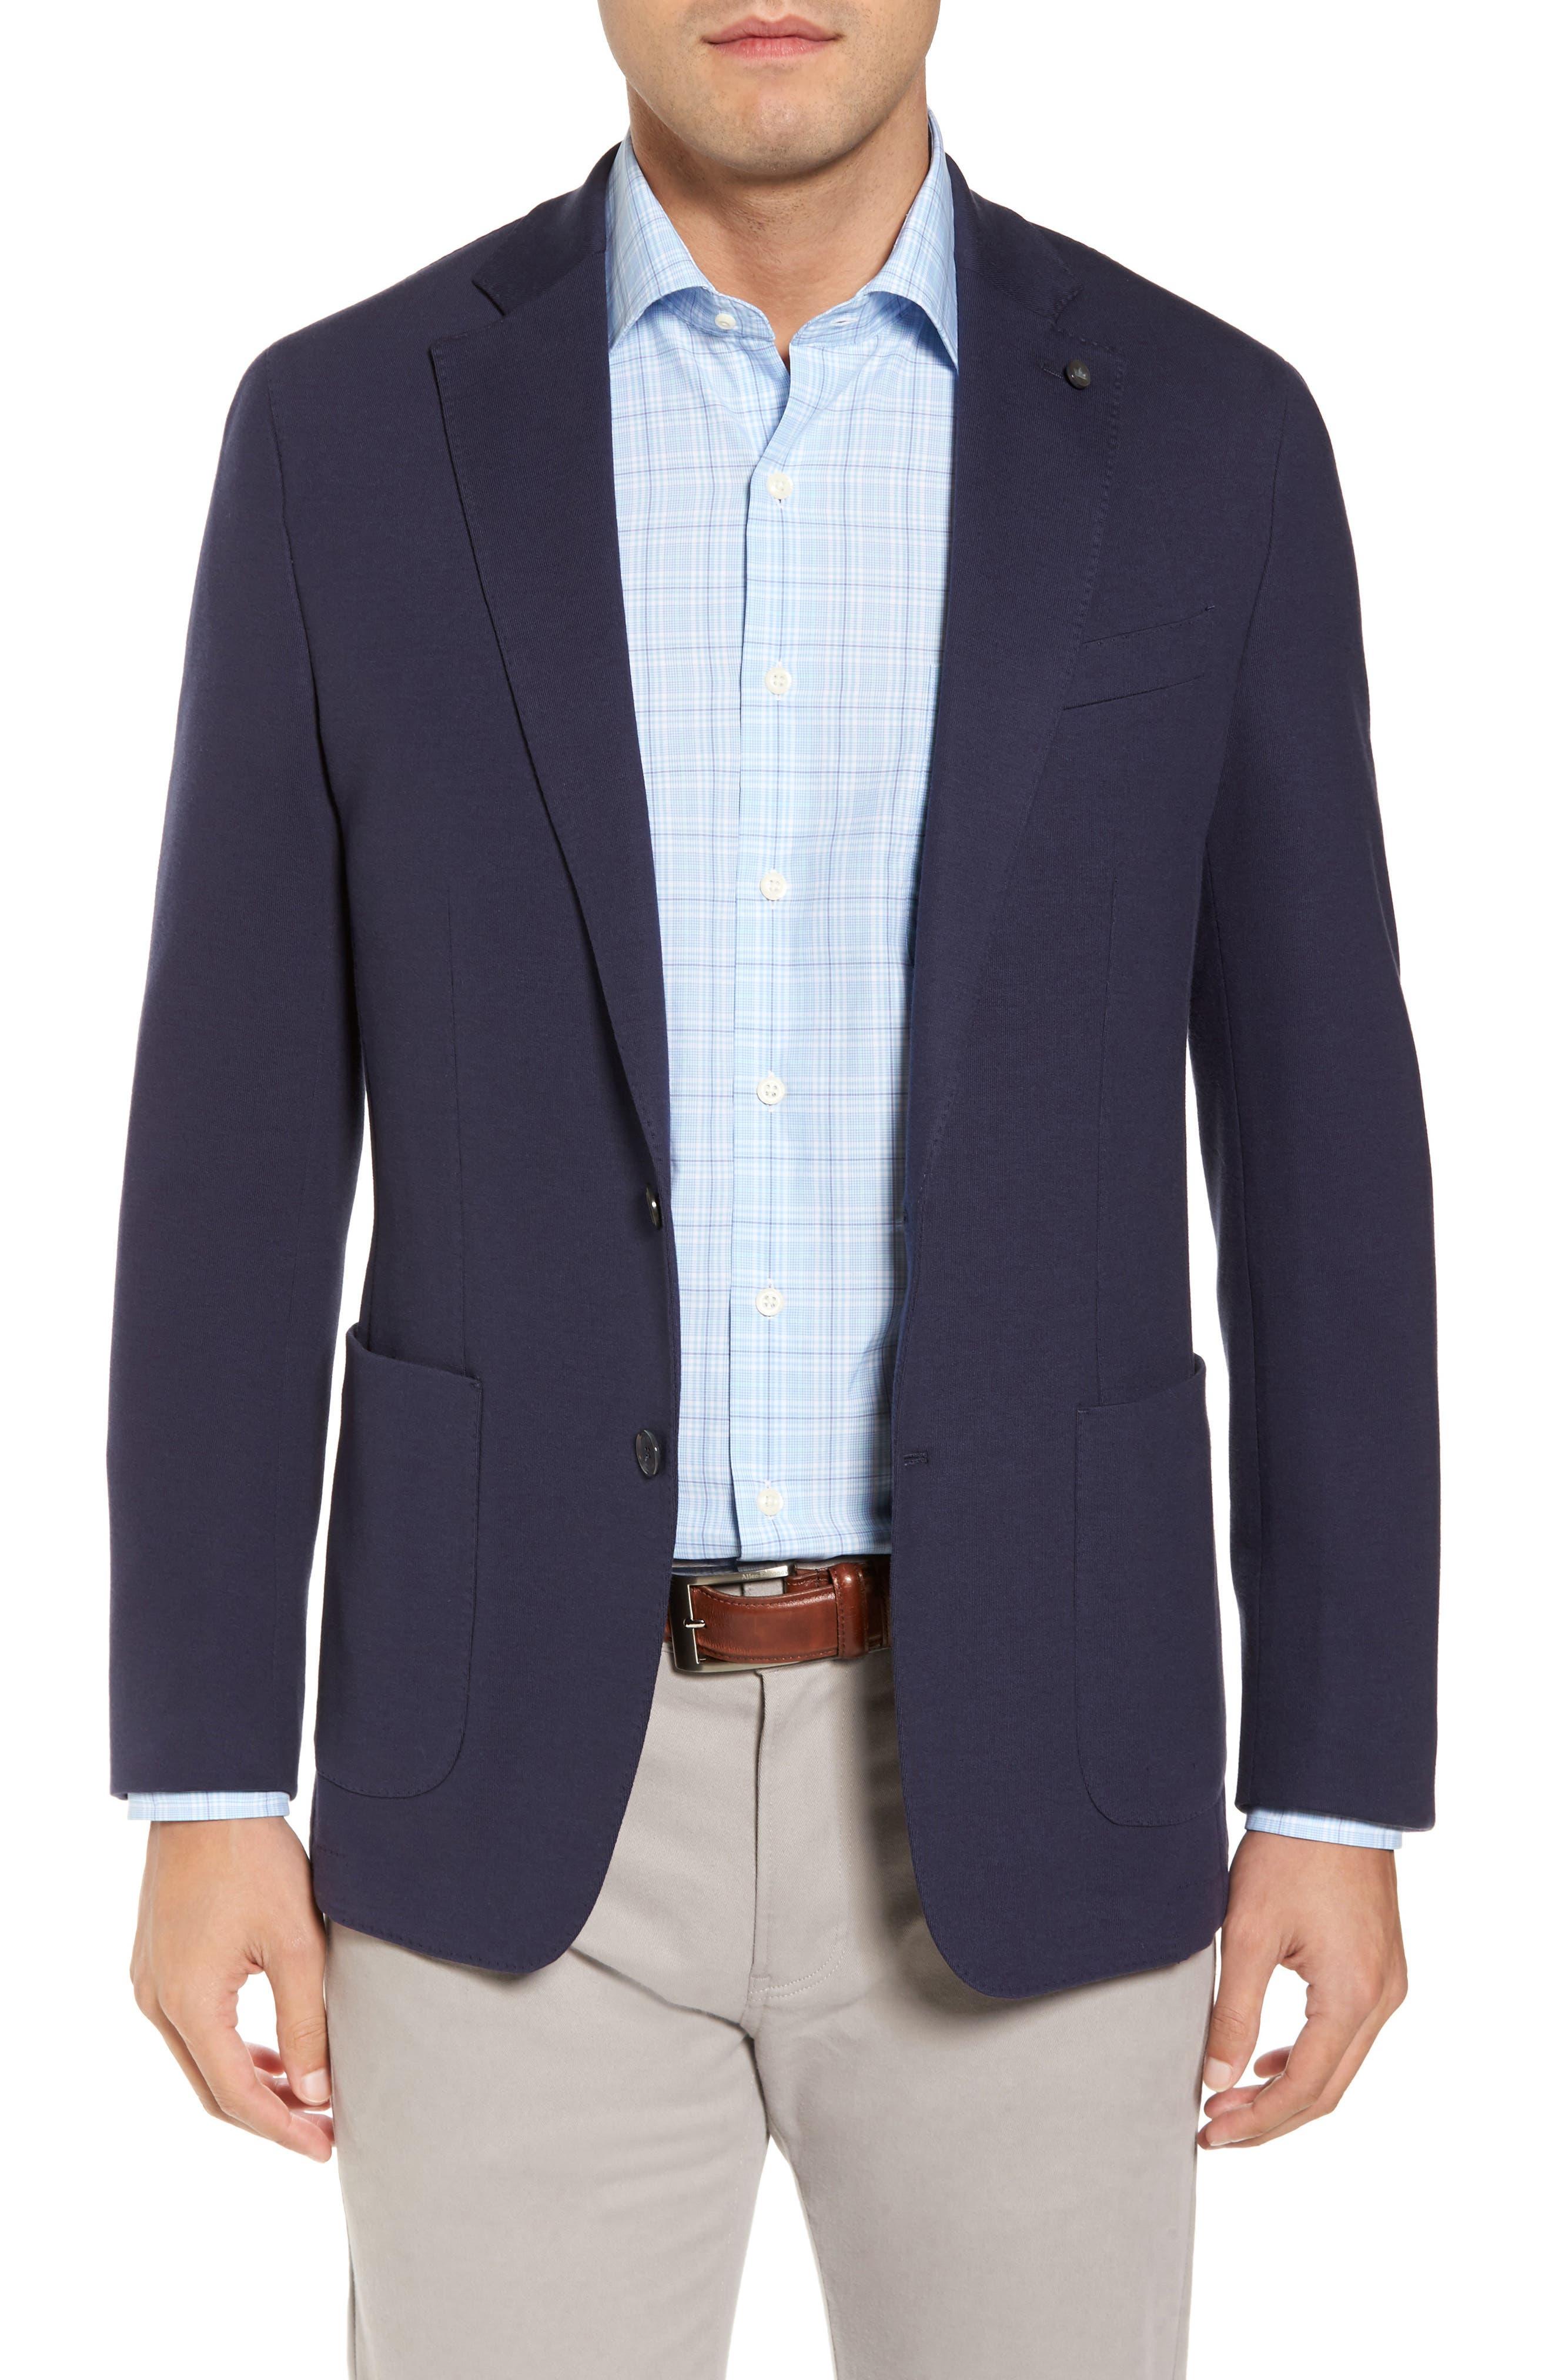 Santorini Jersey Knit Jacket,                         Main,                         color, Starlight Blue